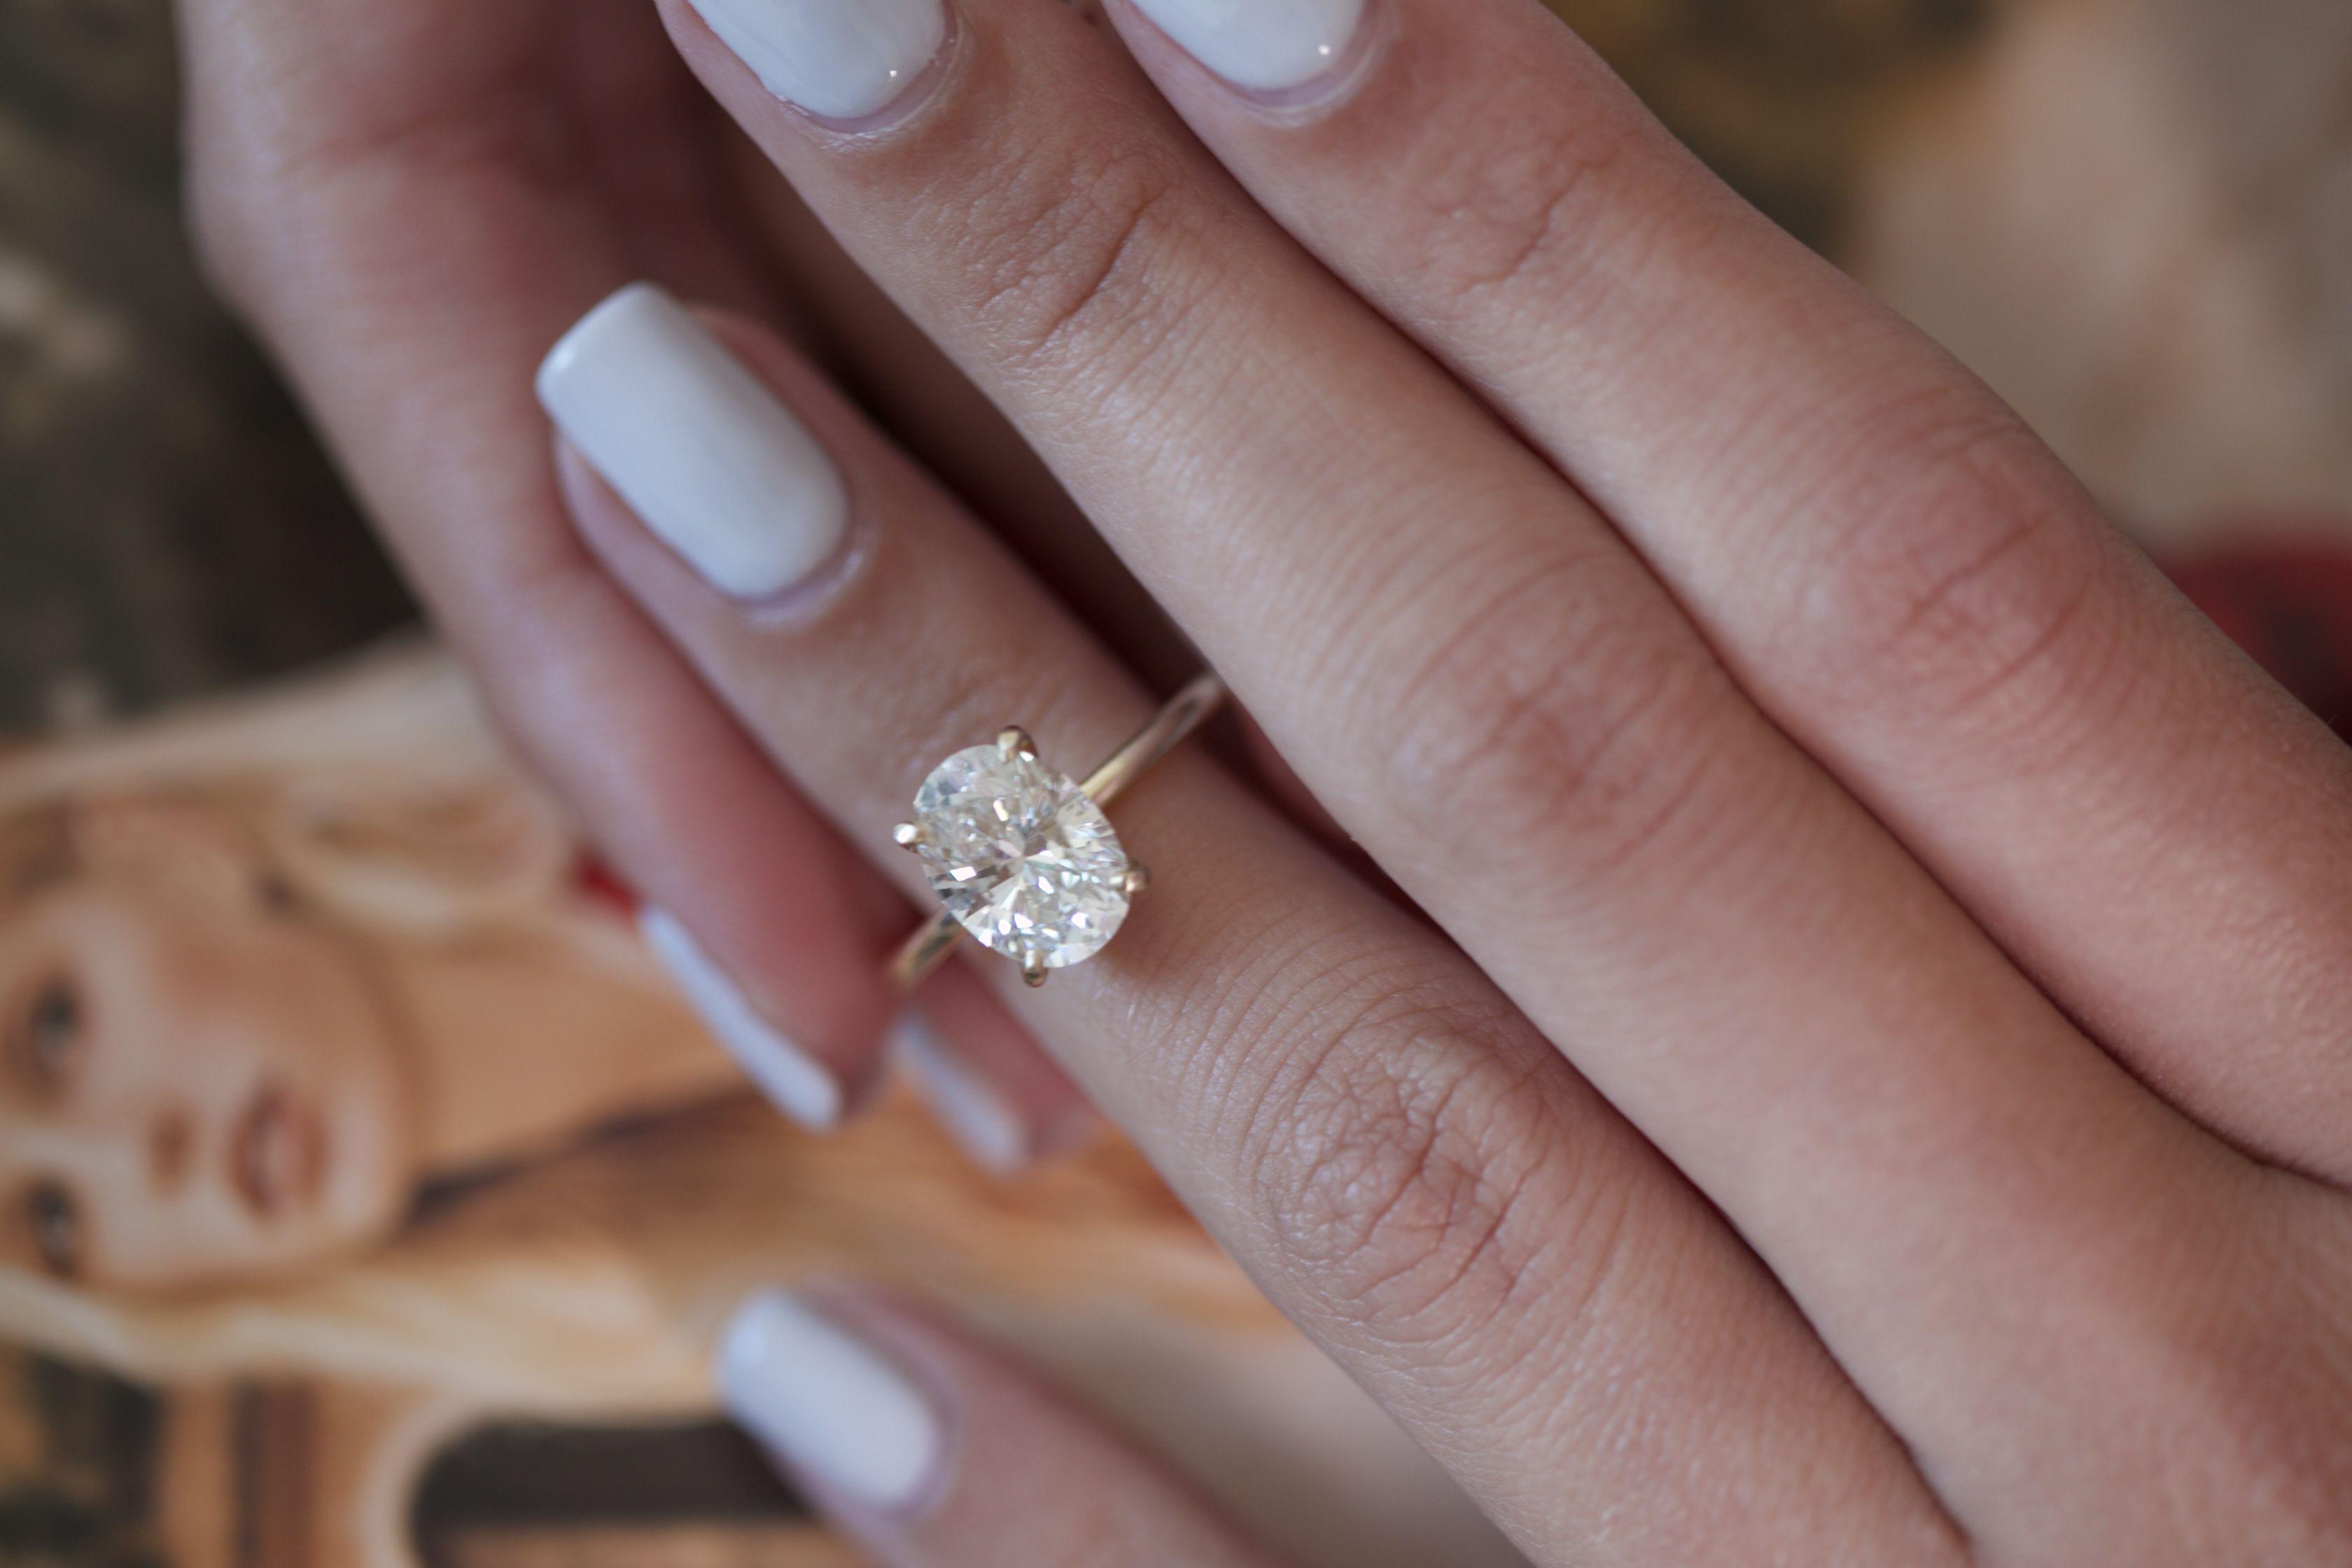 1 50 Carat Oval Diamond Engagement Ring 14k Yellow Gold Diamond Ring Oval Diamond Ring Solitaire Diamond Ring Engagement Ring Oval Diamond Engagement Ring Gold Wrap Ring White Gold Rings